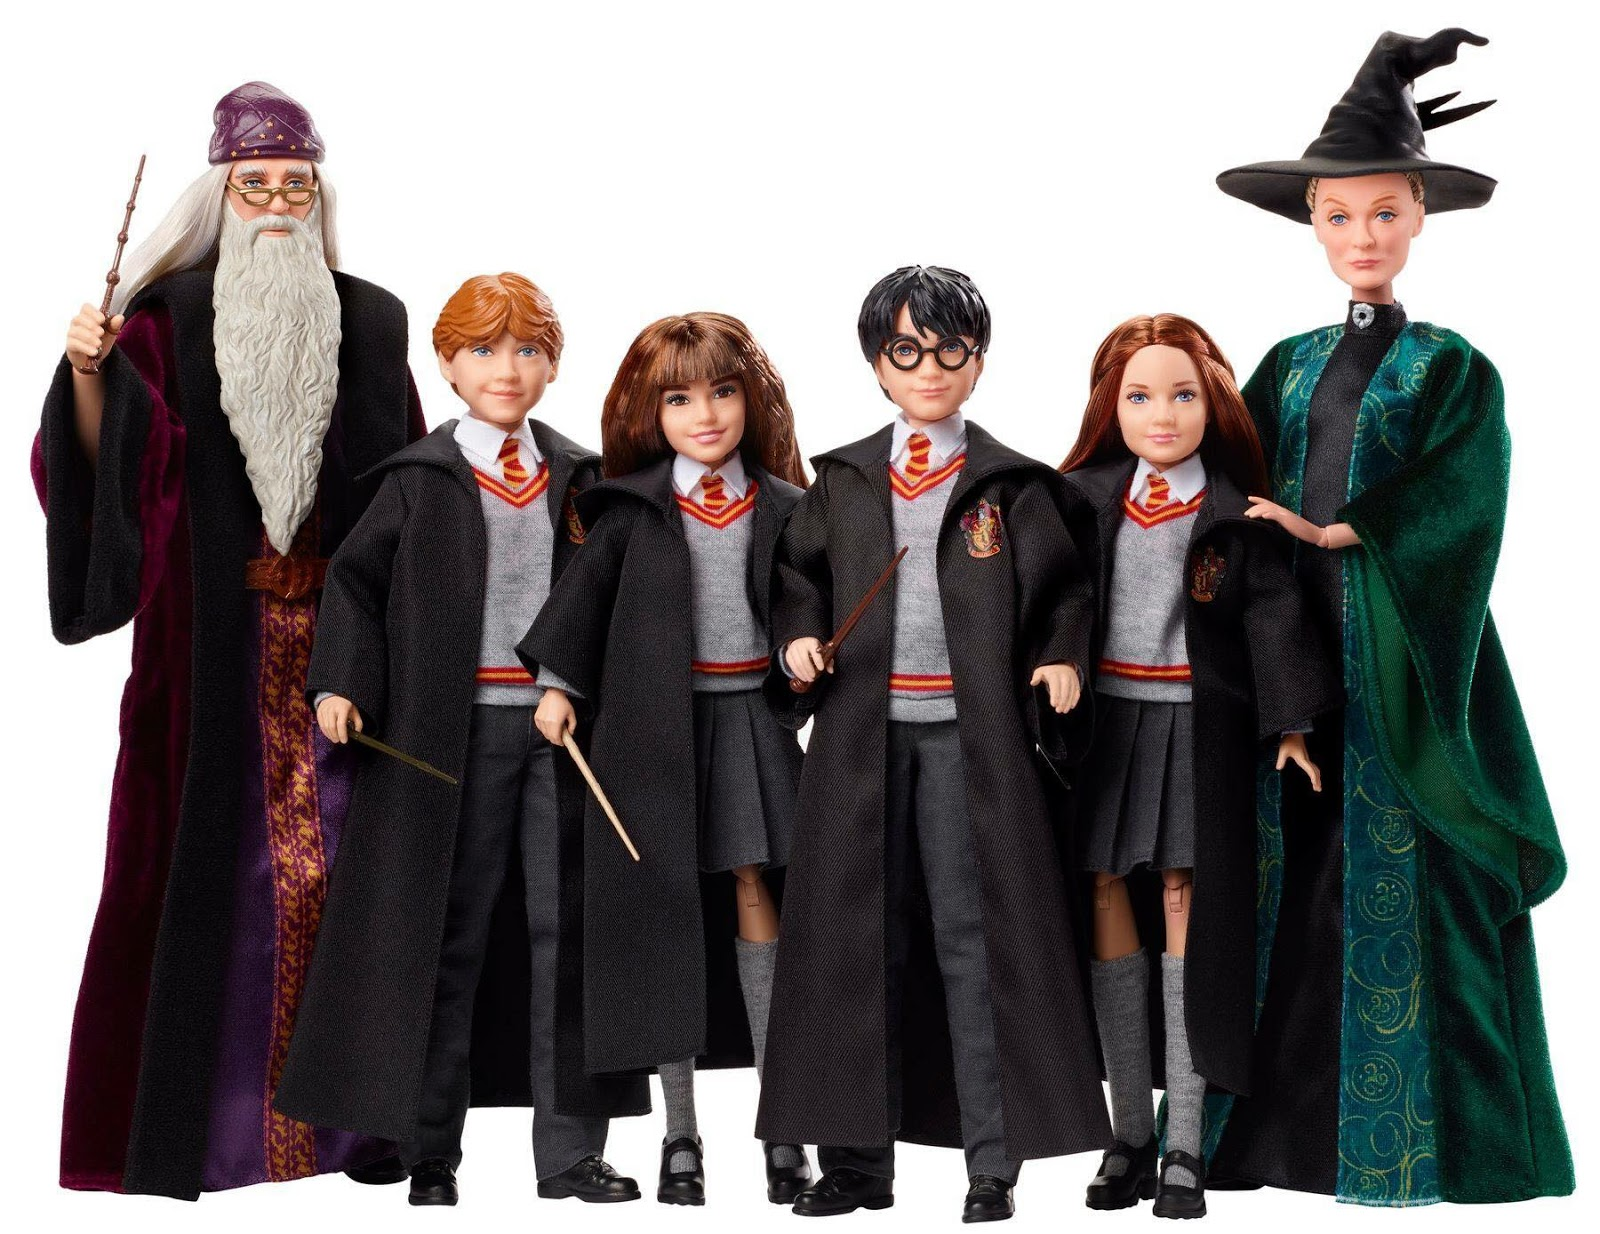 A Mattel vai lançar seis figuras de Harry Potter no estilo Barbie.